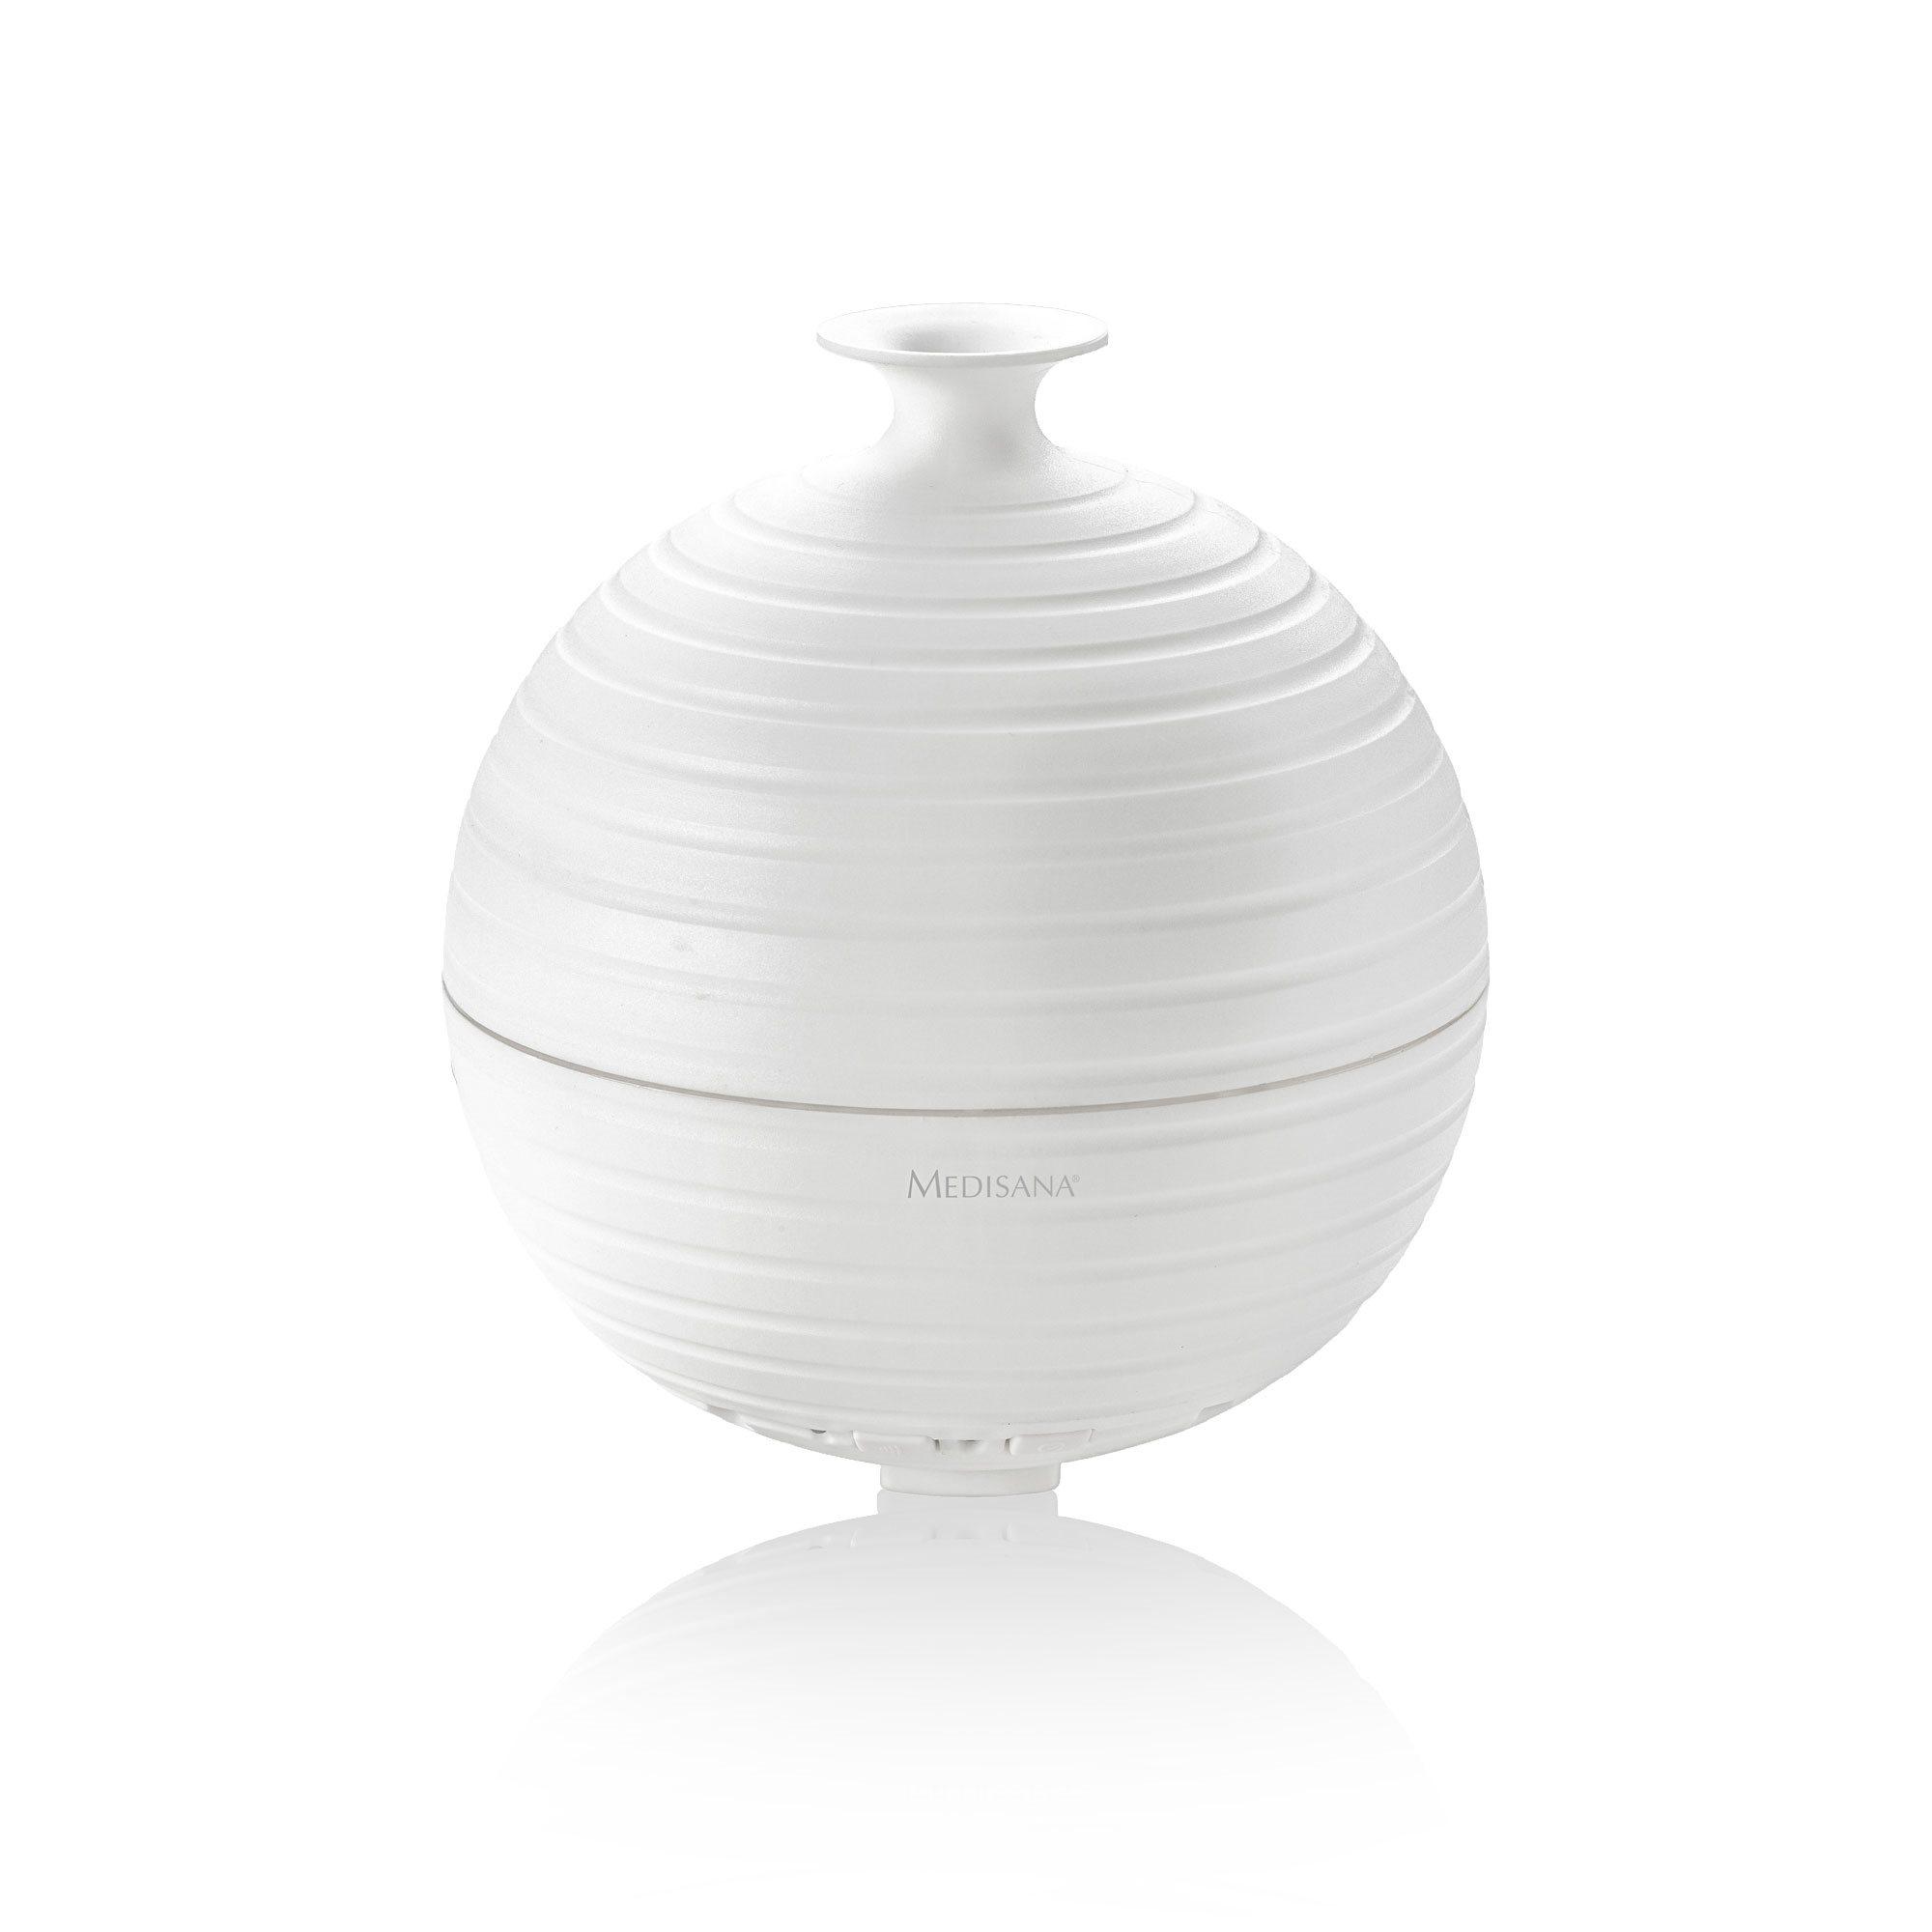 Medisana Συσκευή για Αρωματοθεραπεία AD-620 300ml